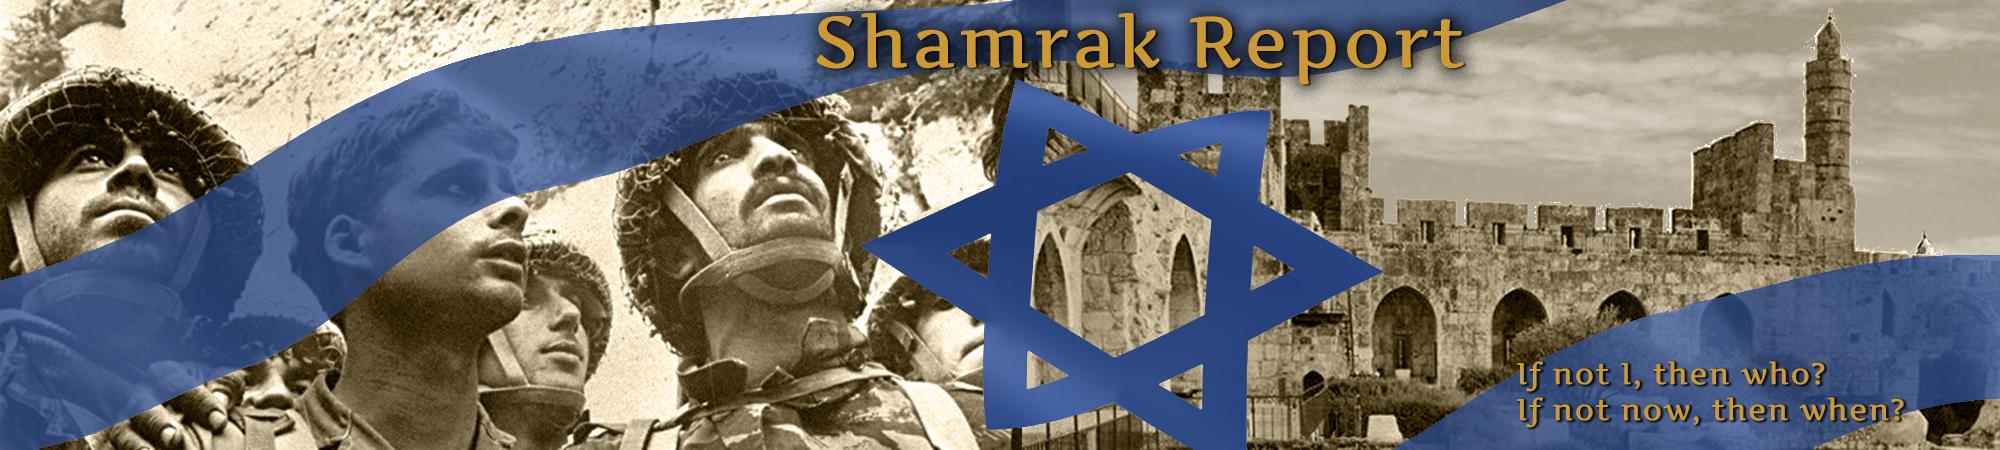 The Shamrak Report